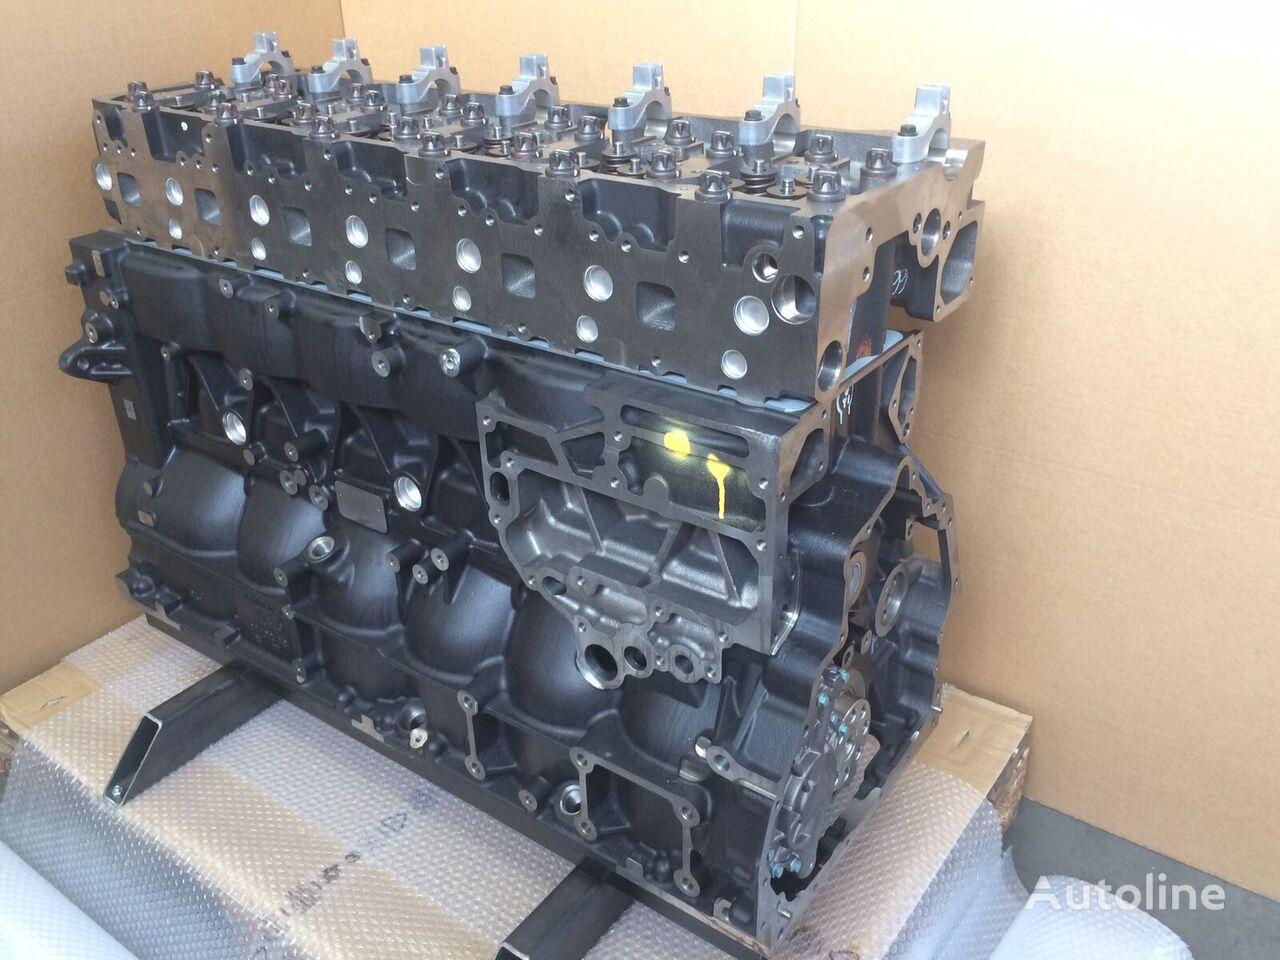 MAN D2676LOH36 engine for bus